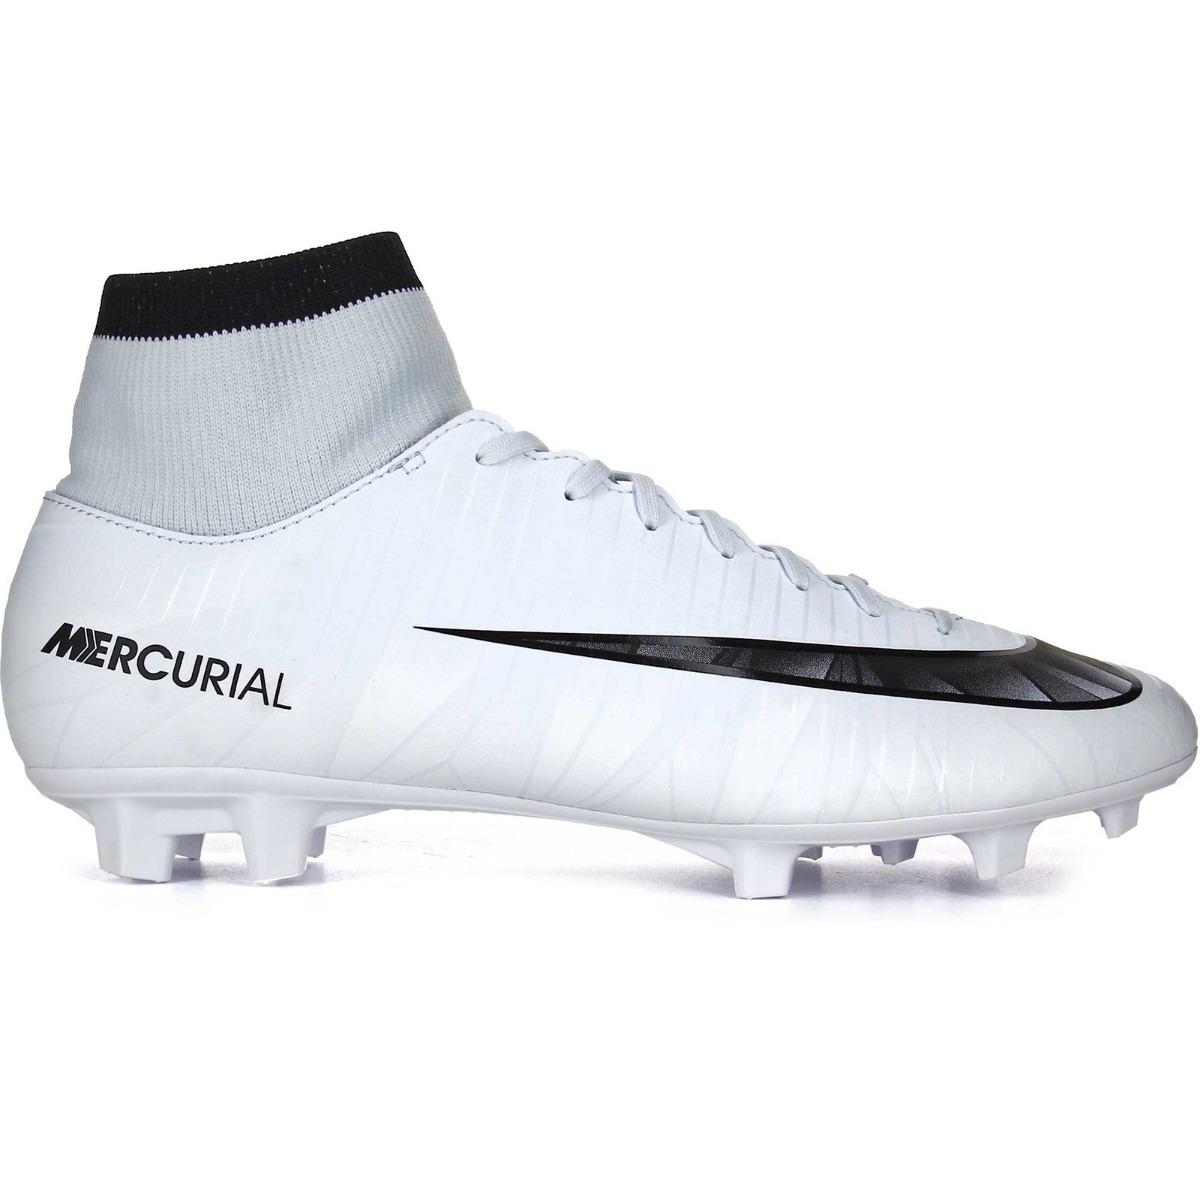 096172b343525 Zapatos Fútbol Nike Mercurial Victory Vi Cr7 Fg 903605-401 -   39.990 en  Mercado Libre